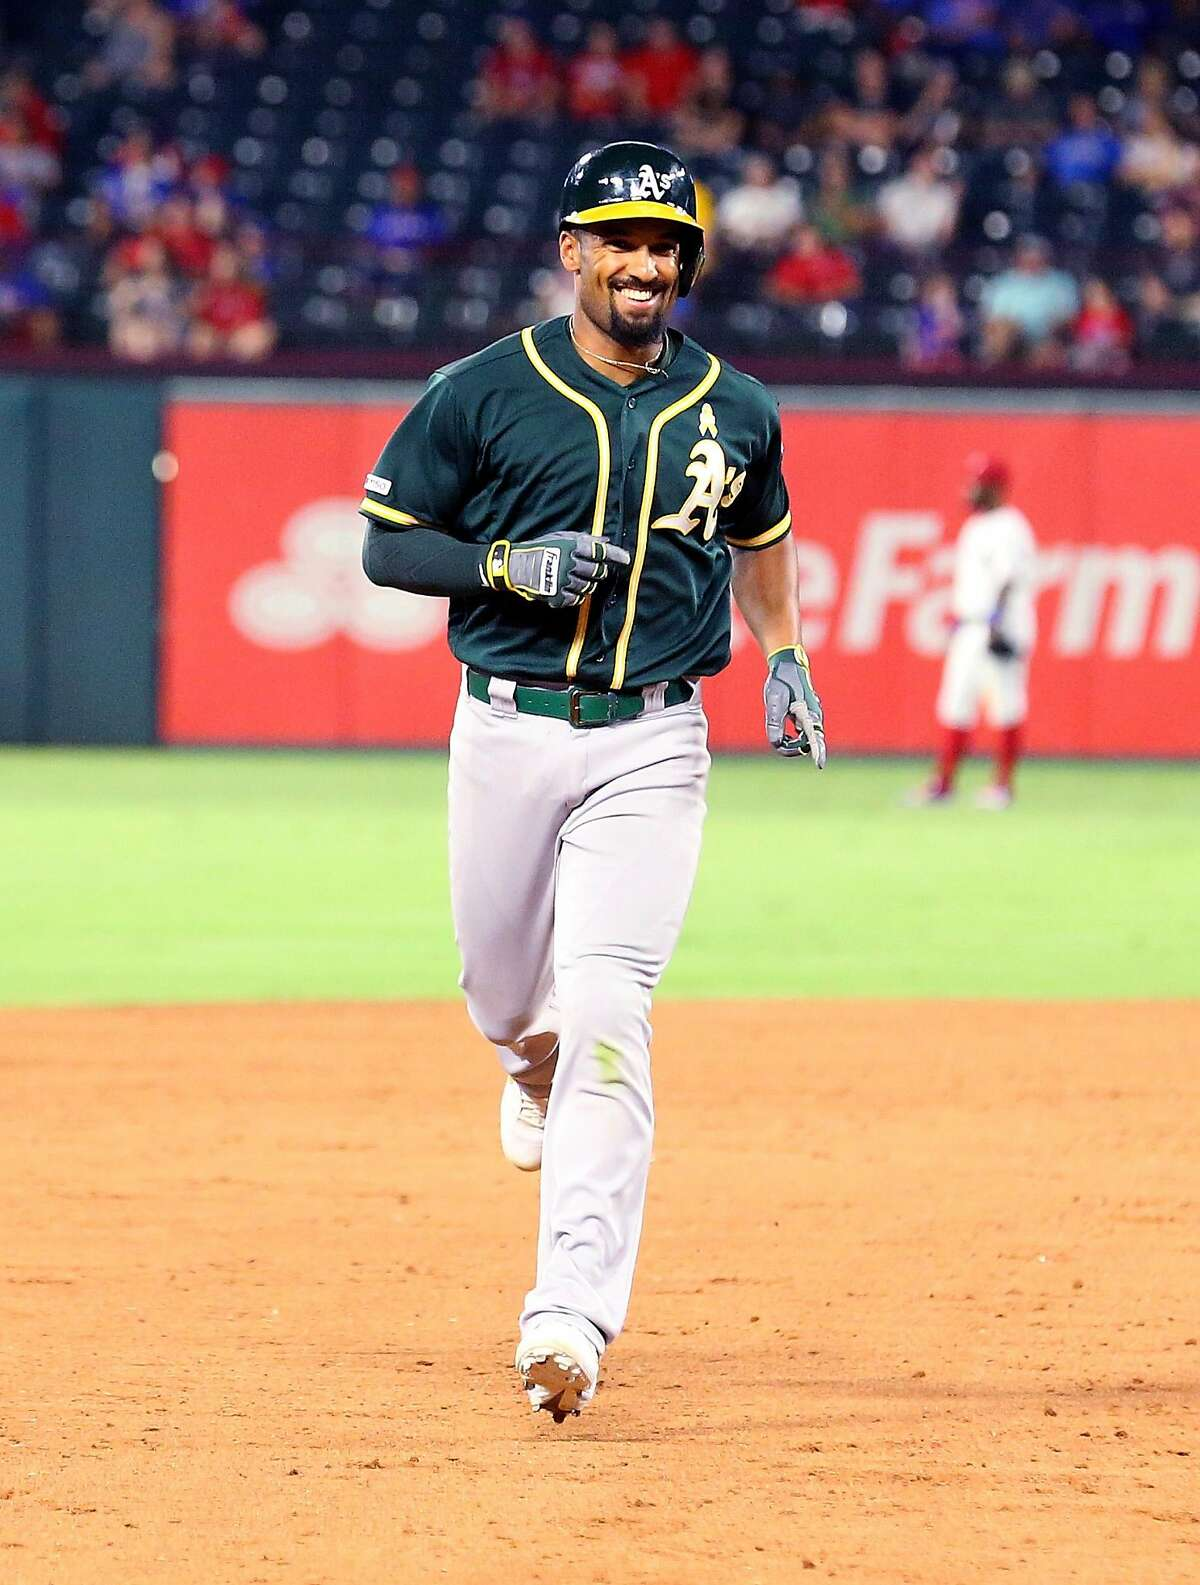 ARLINGTON, TEXAS - SEPTEMBER 13: Marcus Semien #10 of the Oakland Athletics runs the bases on a two-run home run against the Texas Rangers at Globe Life Park in Arlington on September 13, 2019 in Arlington, Texas. ~~